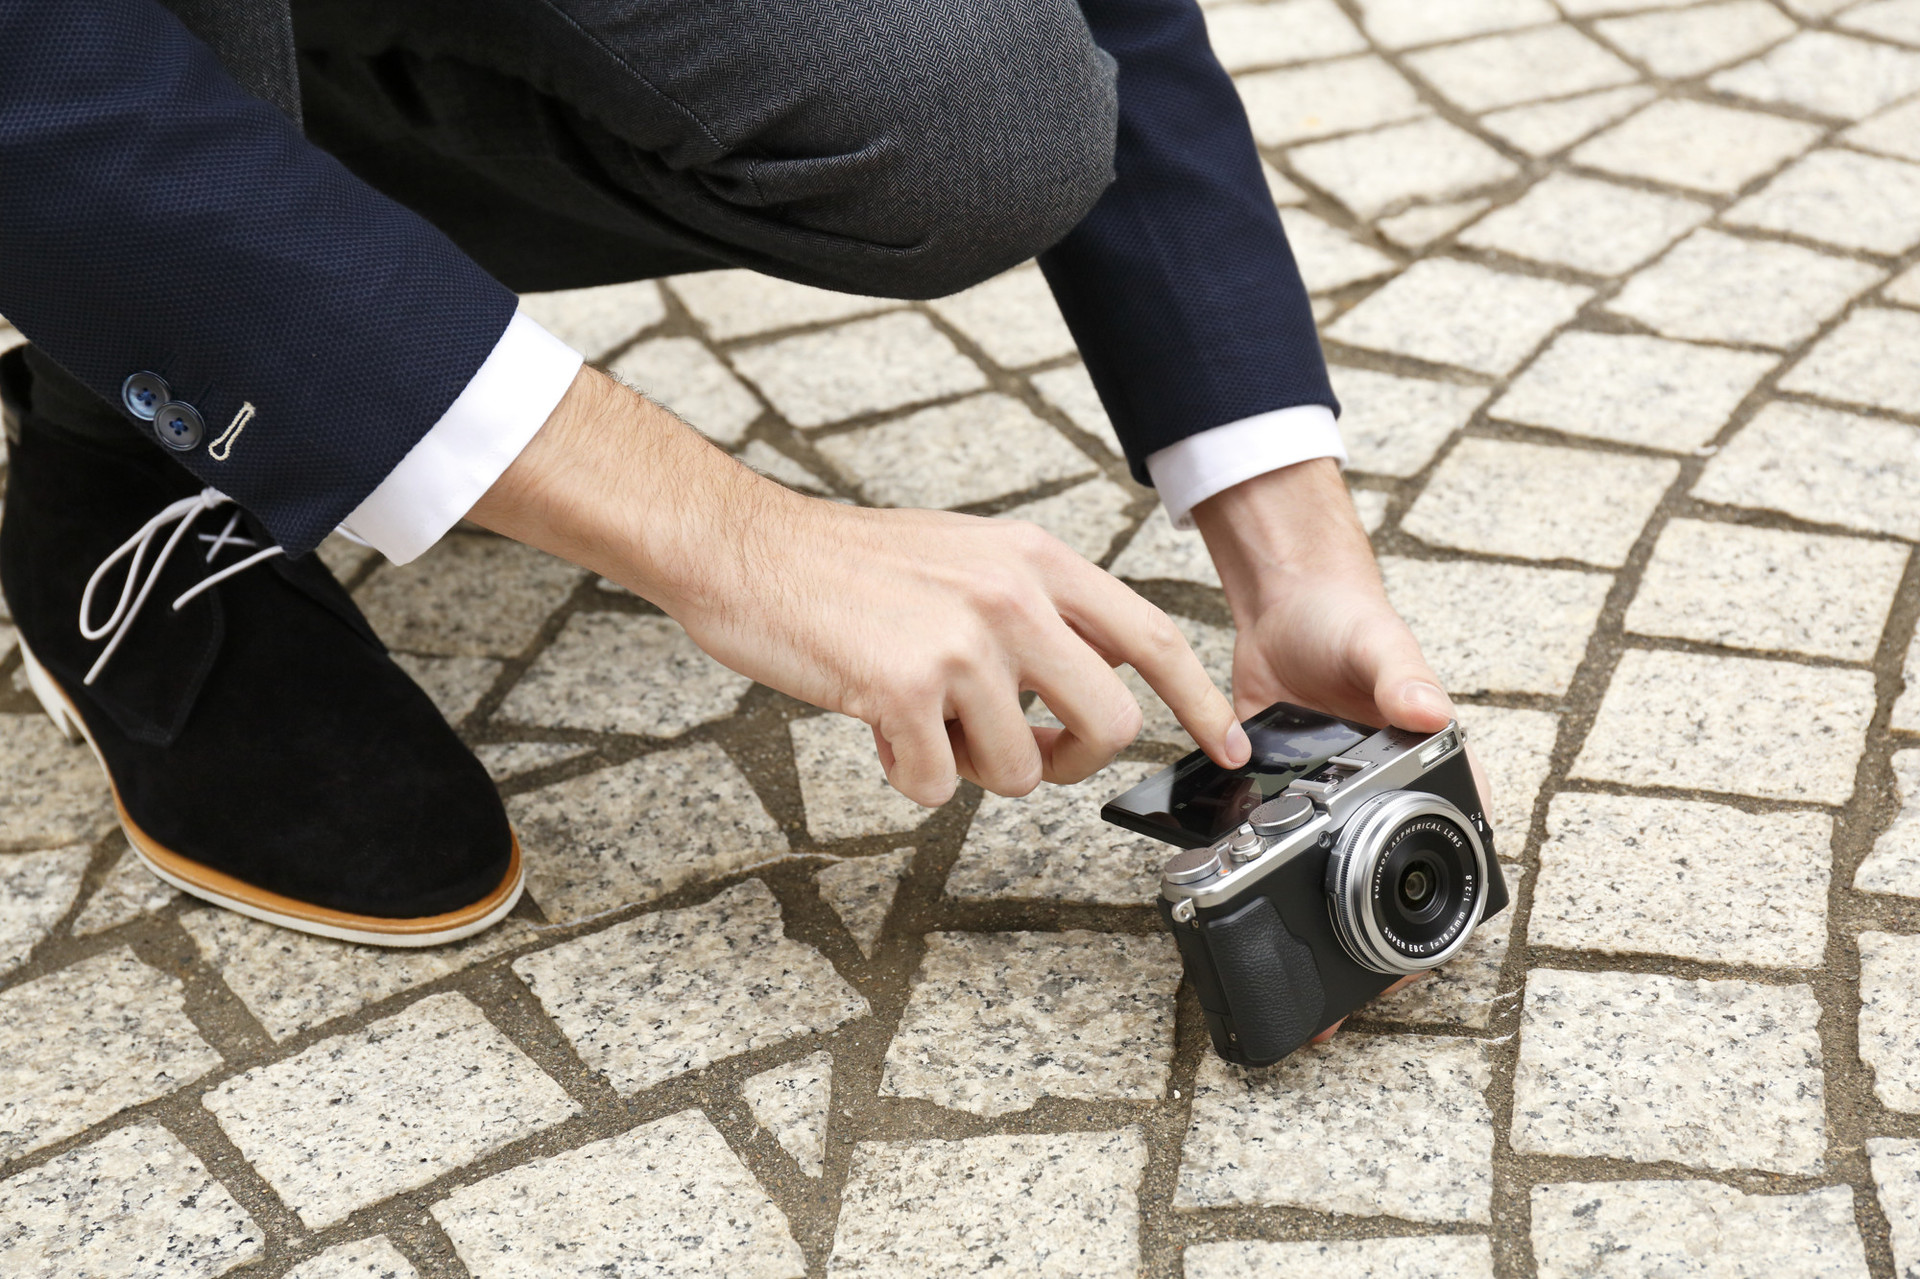 Fujifilm выпустила три новинки:  две камеры премиум-класса X-Pro2 и X70, а также супер-телеобъектив Fujinon XF100-400